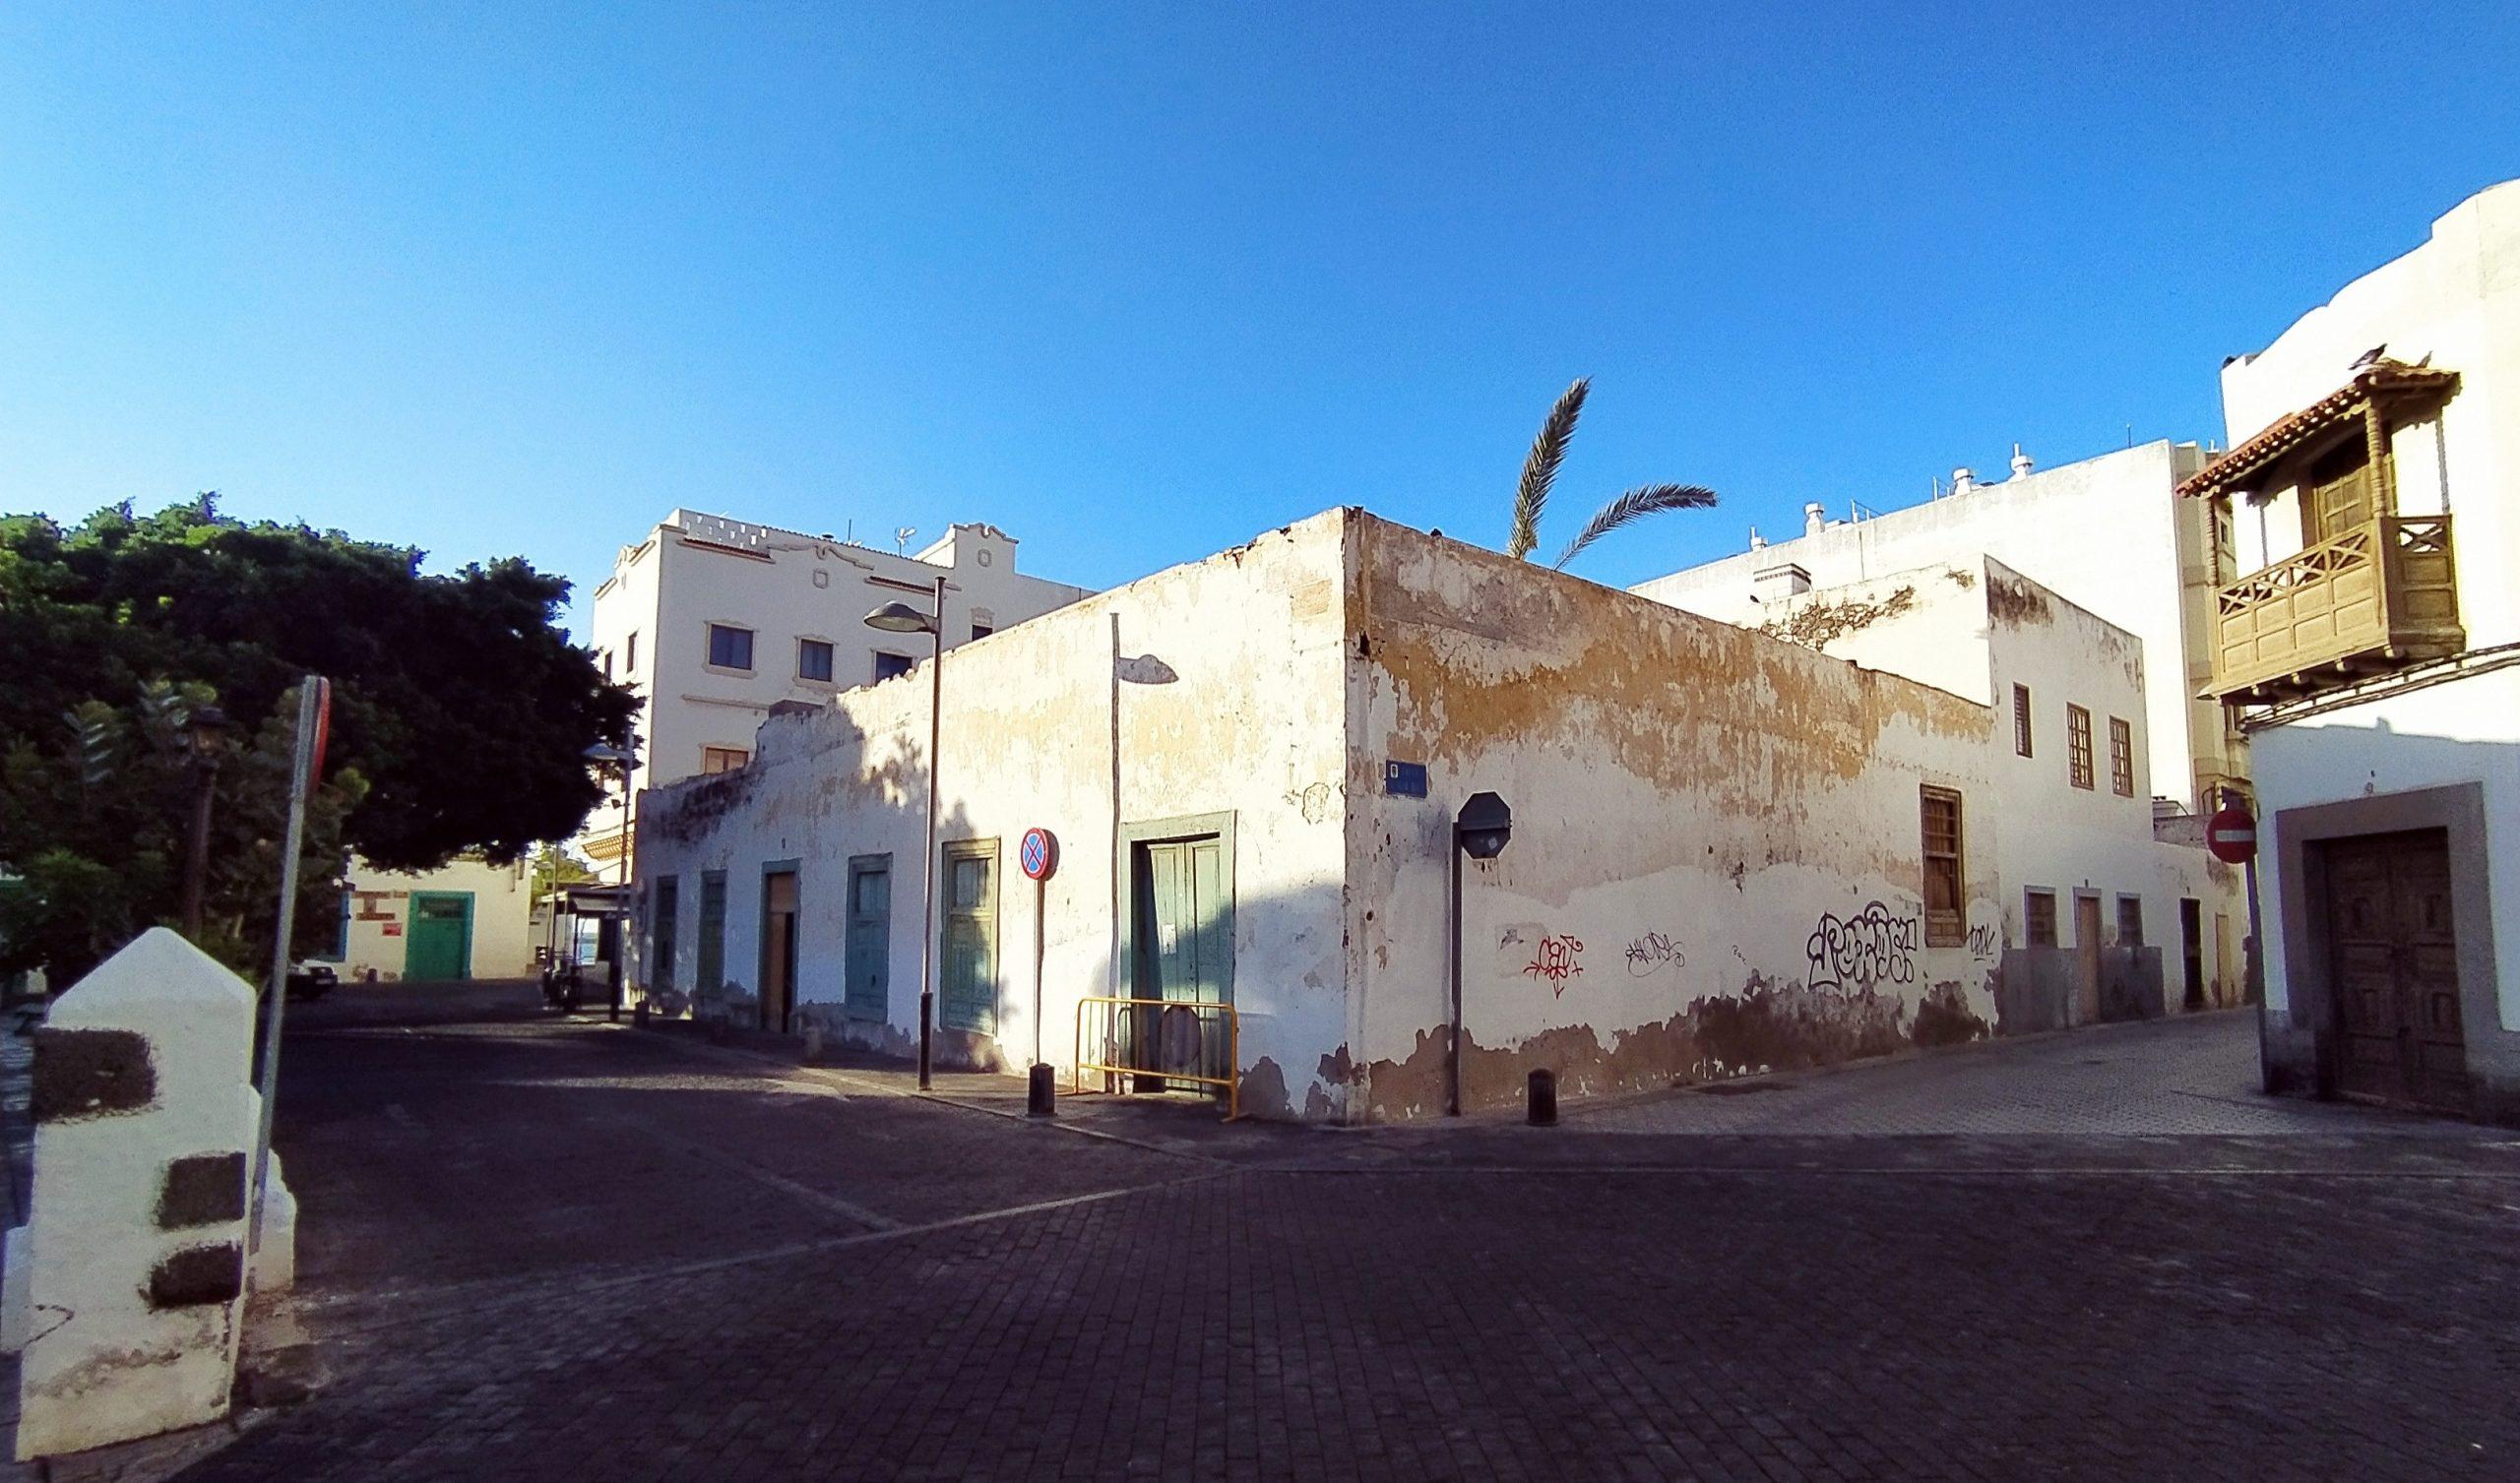 Arrecife otorga licencia para restaurar una casa histórica junto a la iglesia de San Ginés